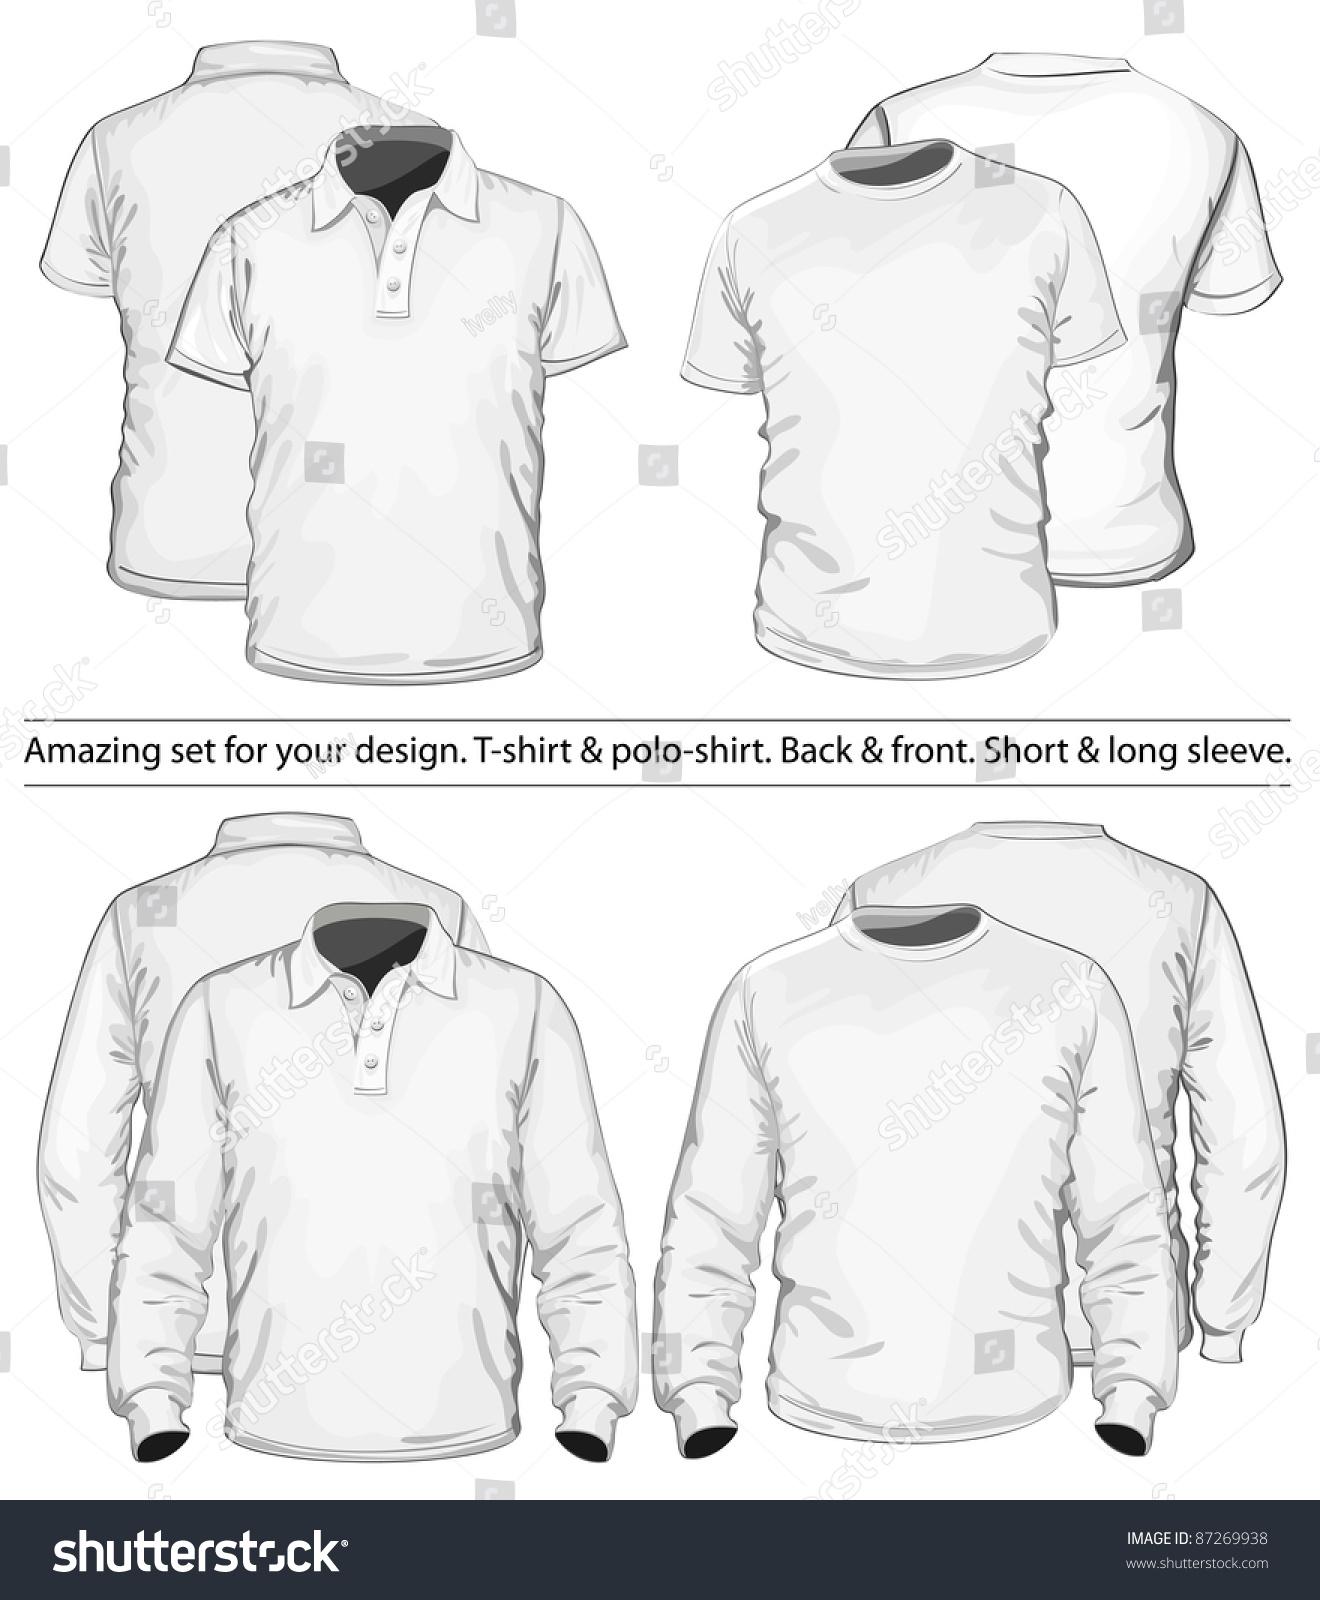 Shirt design vector pack - Amazing Vector Set Men S Polo Shirt And T Shirt Design Template Front